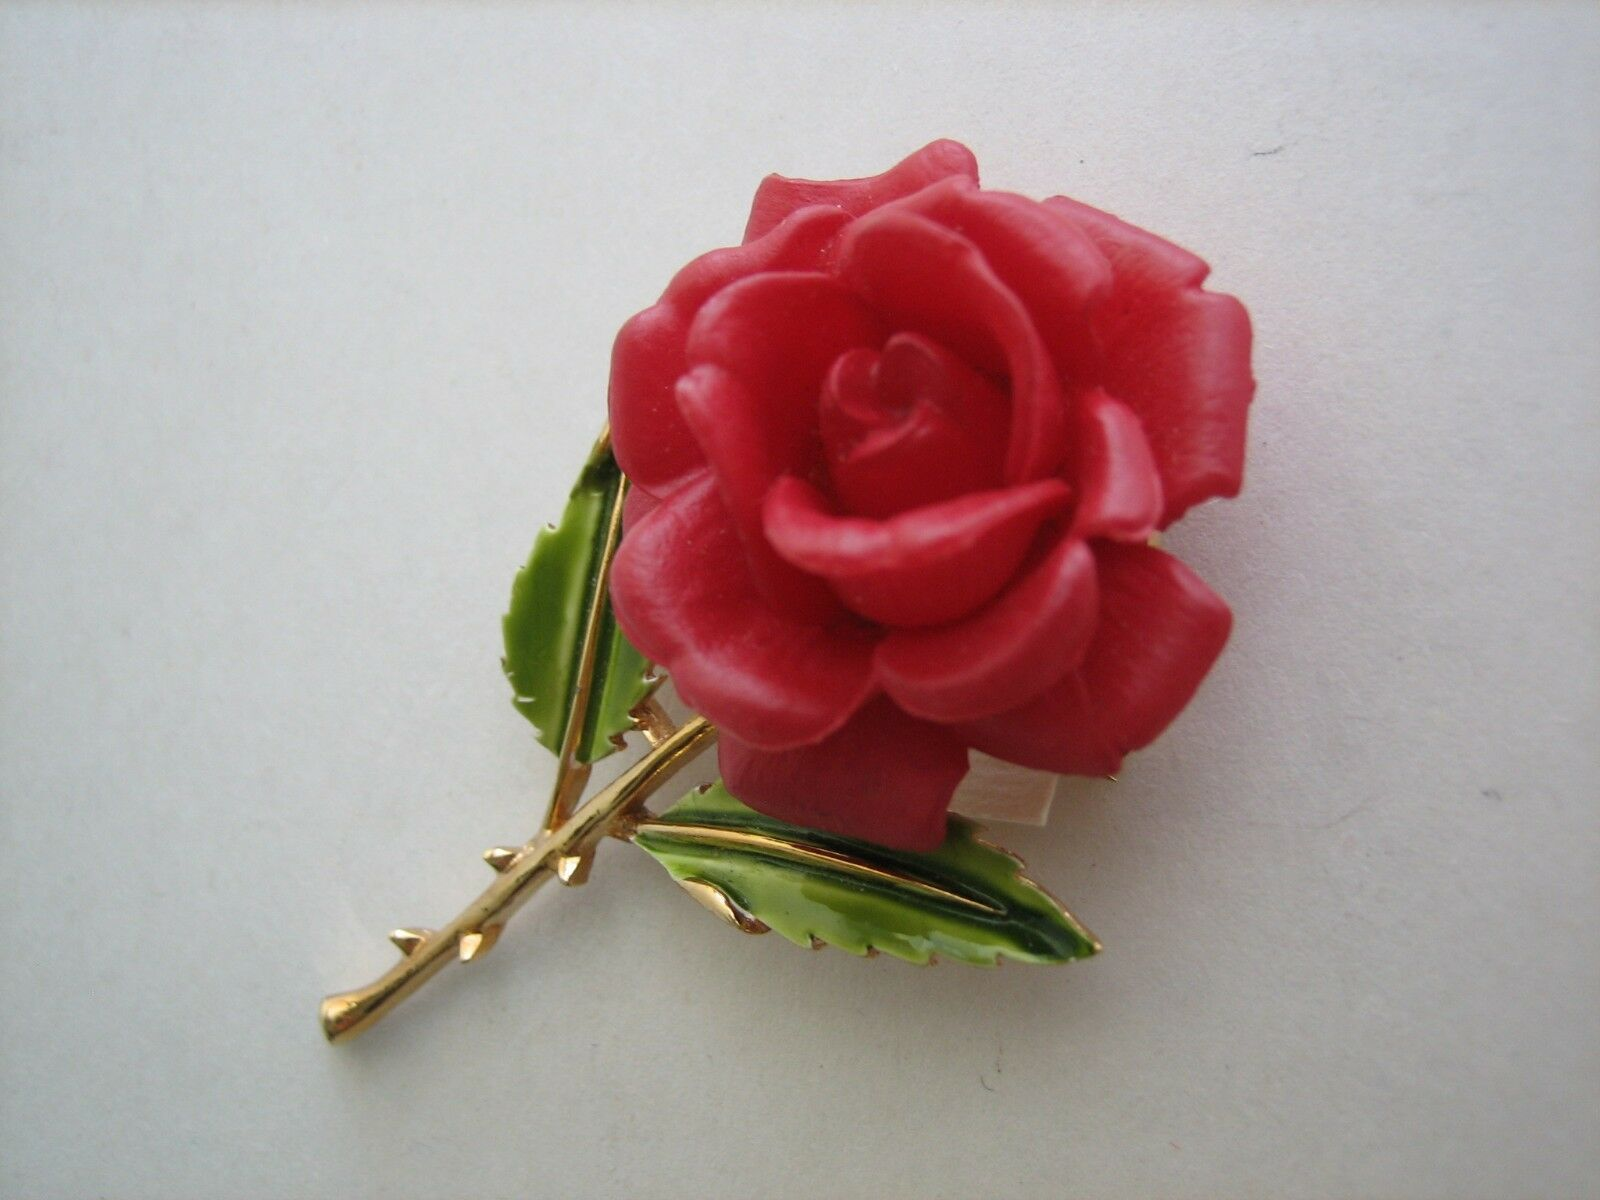 Trifari vintage spilla rosa rossa e trifanium dorato smaltato smaltato smaltato anni '60 a99f02